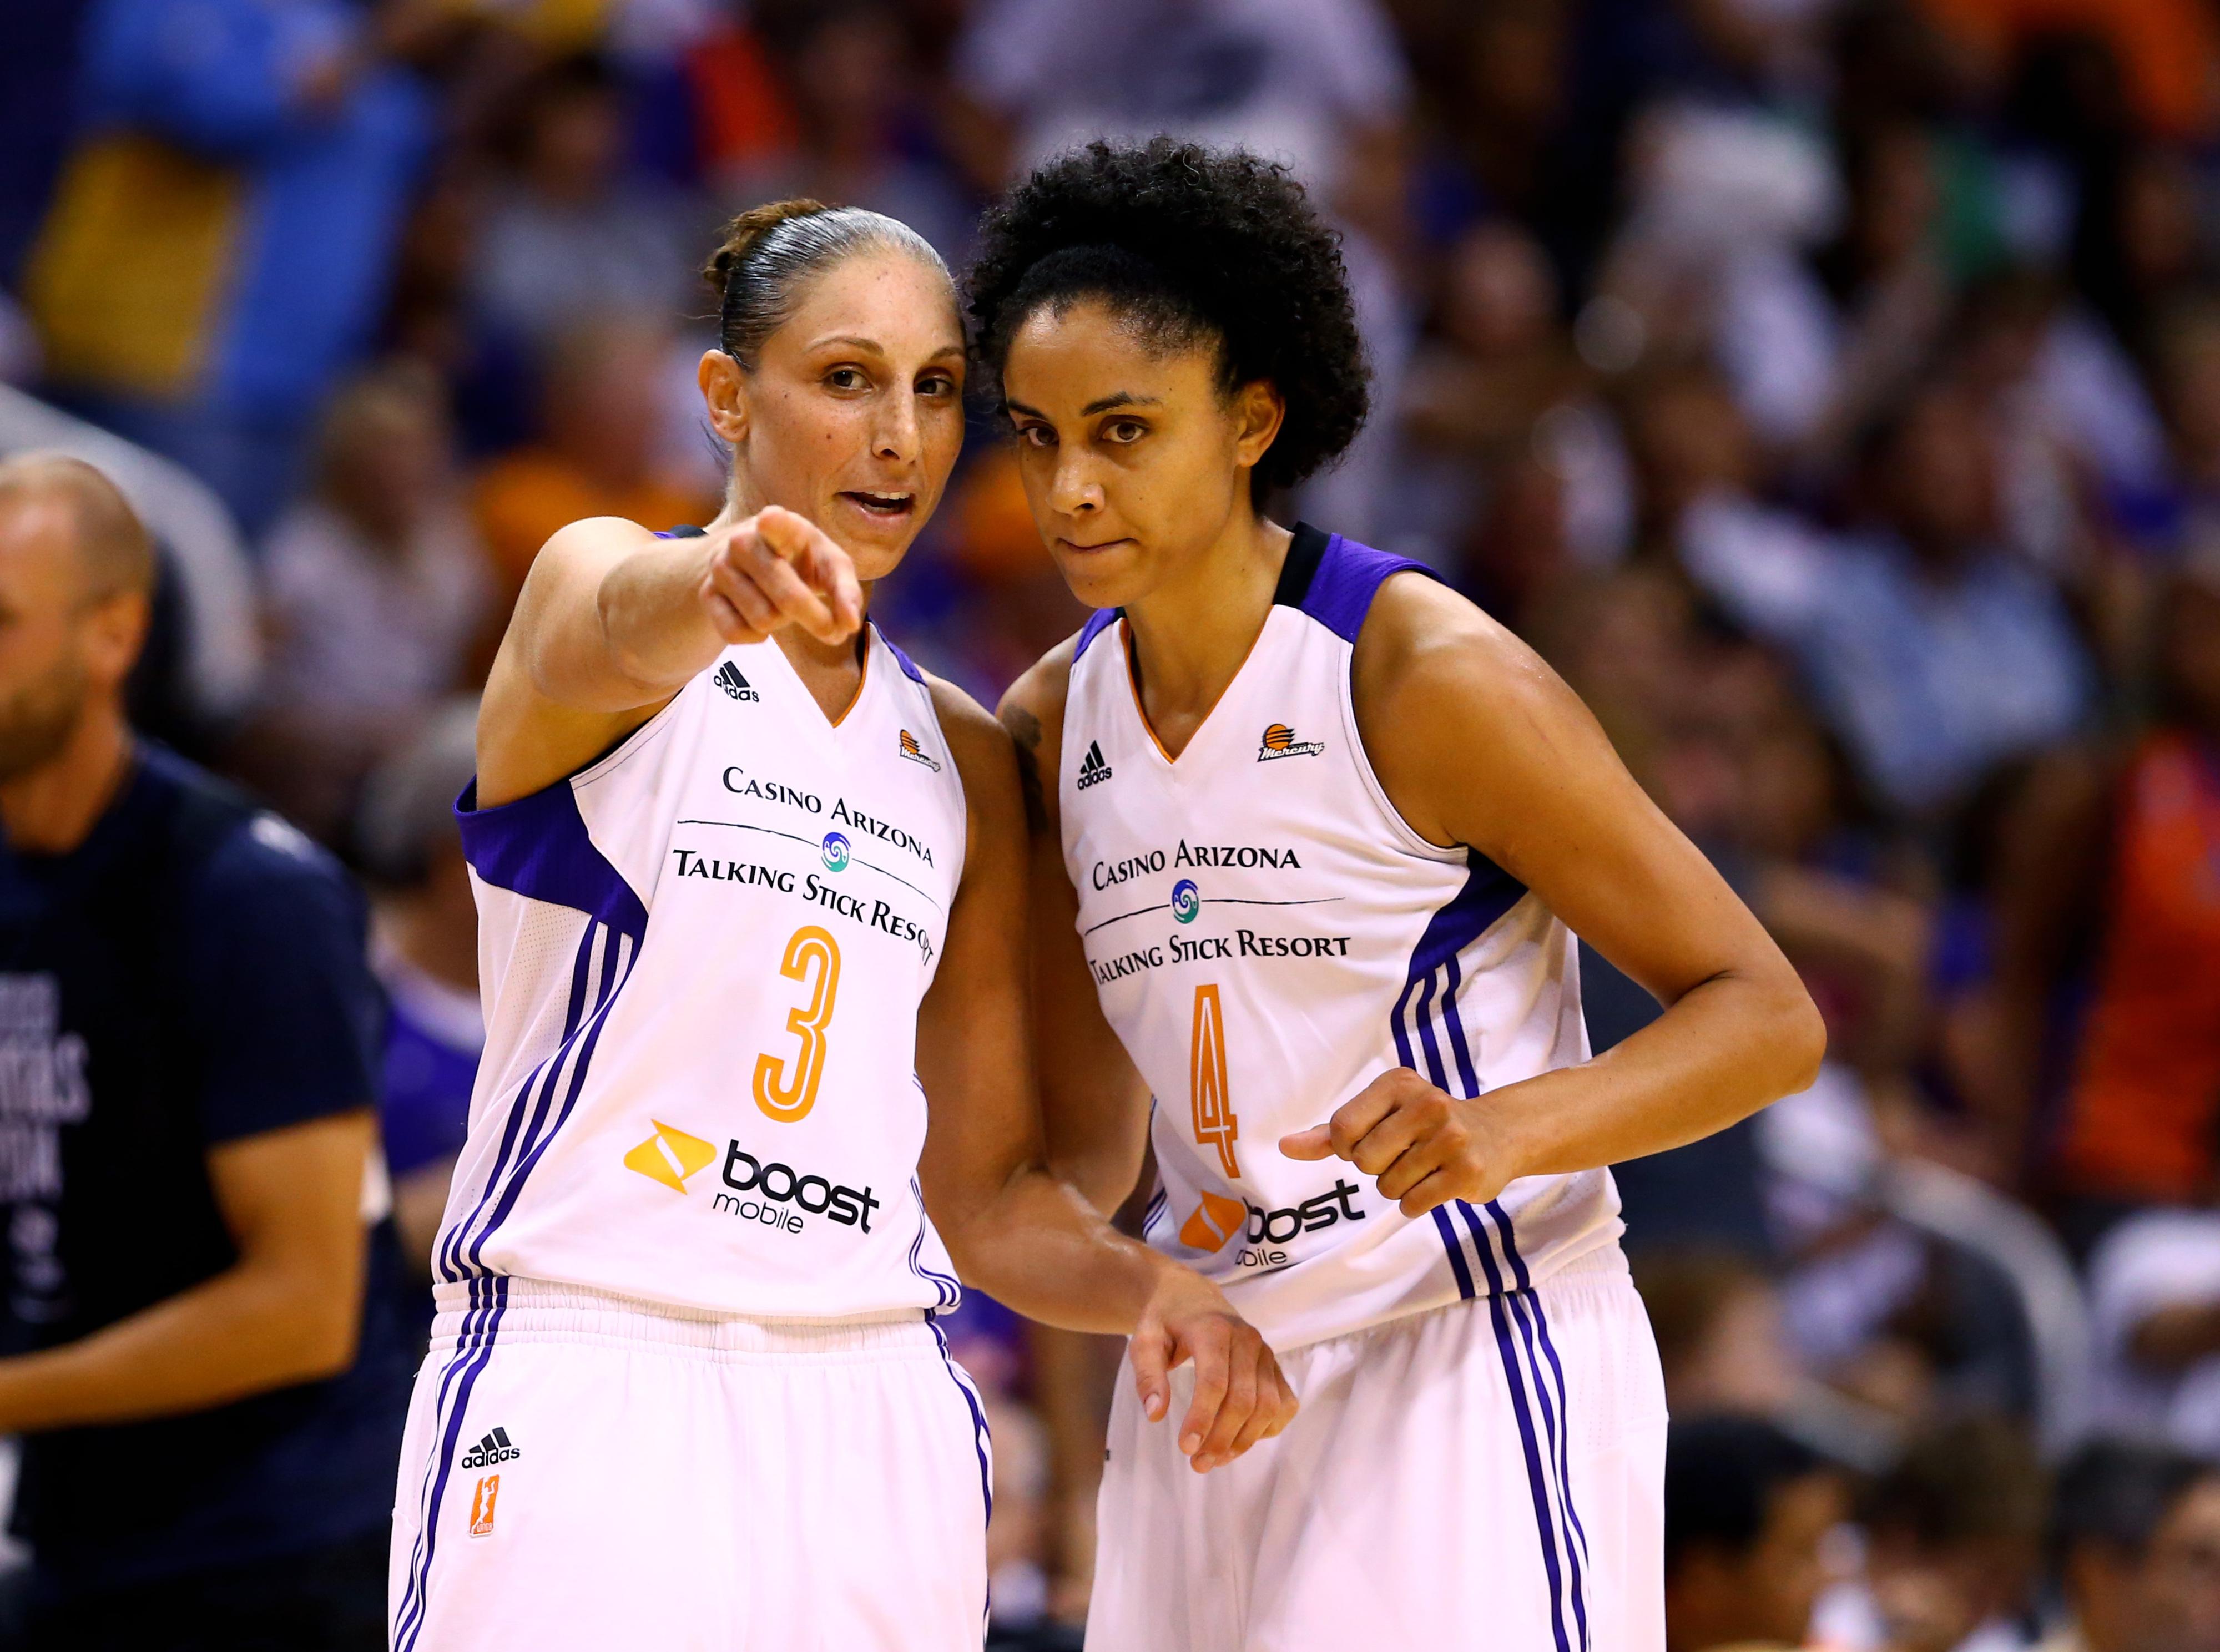 Phoenix Mercury teammates Candice Dupree and Diana Taurasi will join USA Basketball in Paris.